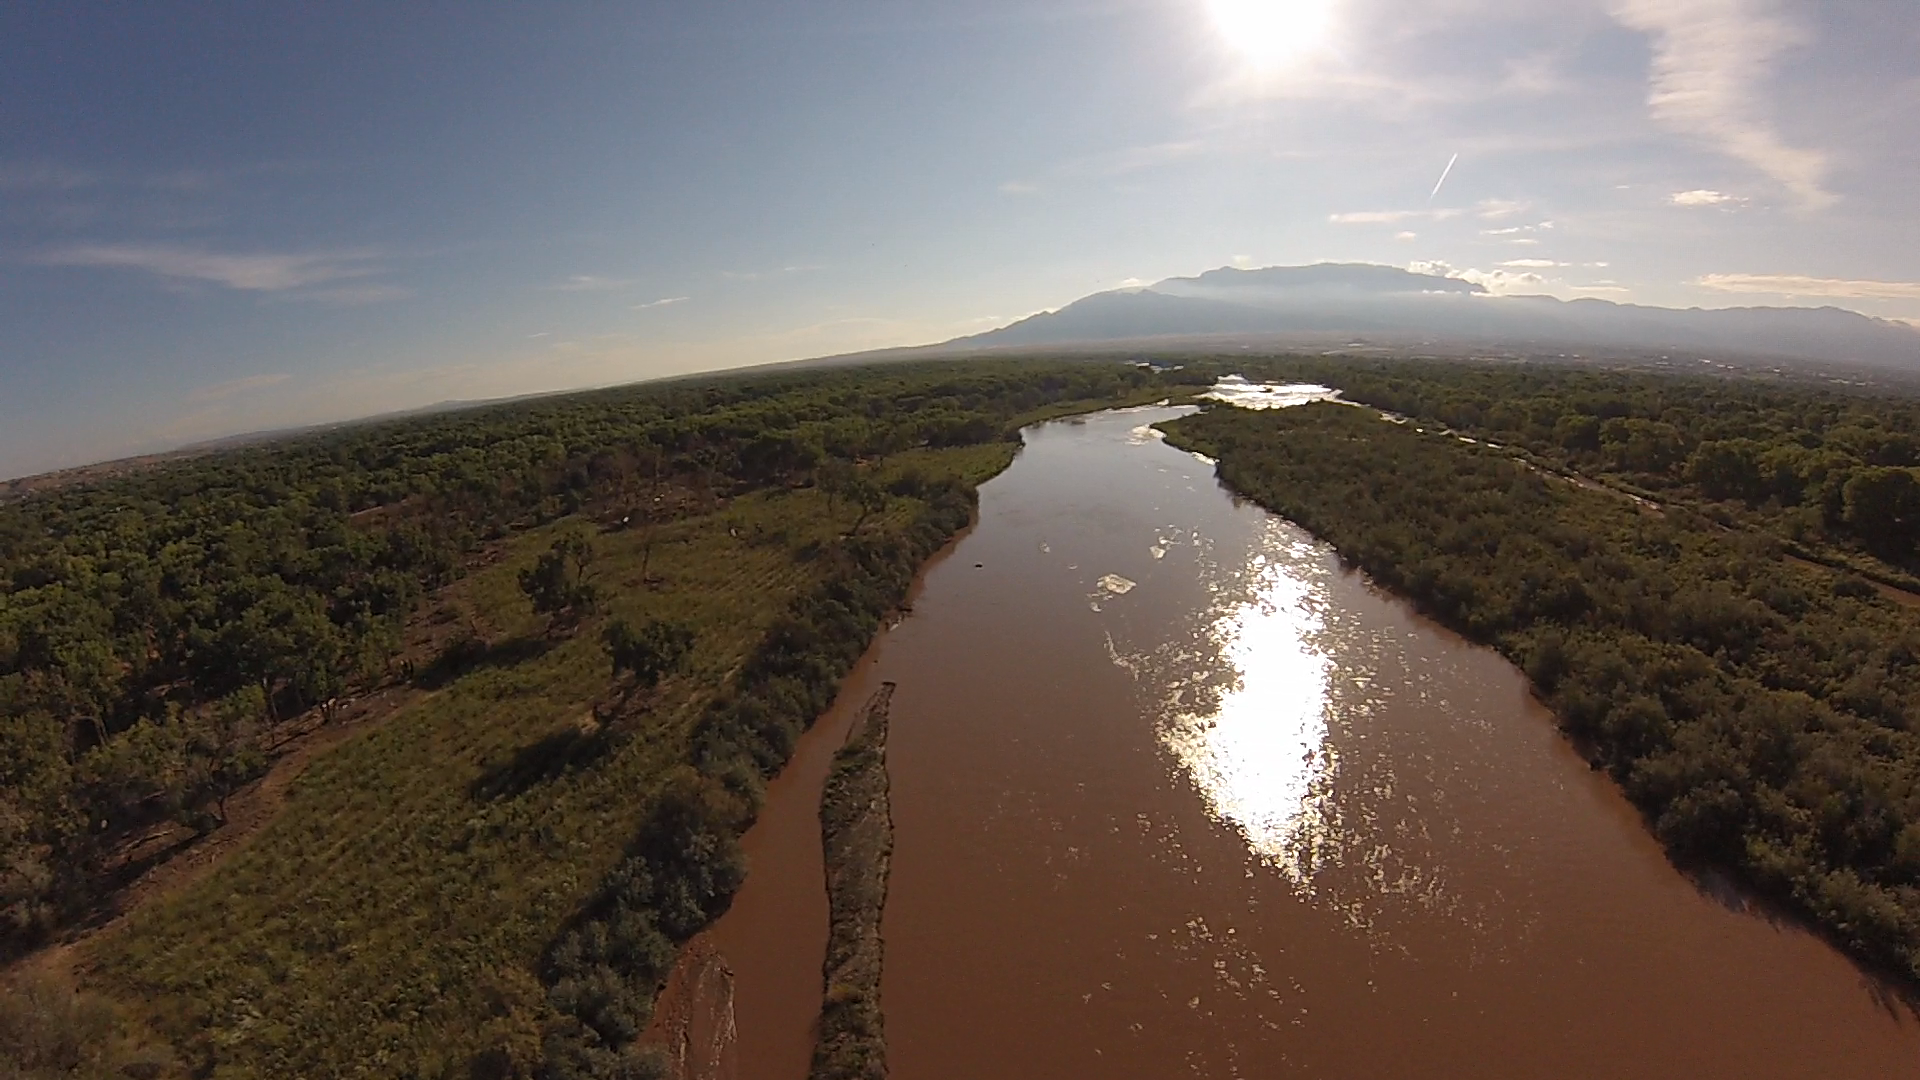 Rio Grande River near Alameda Blvd, USA